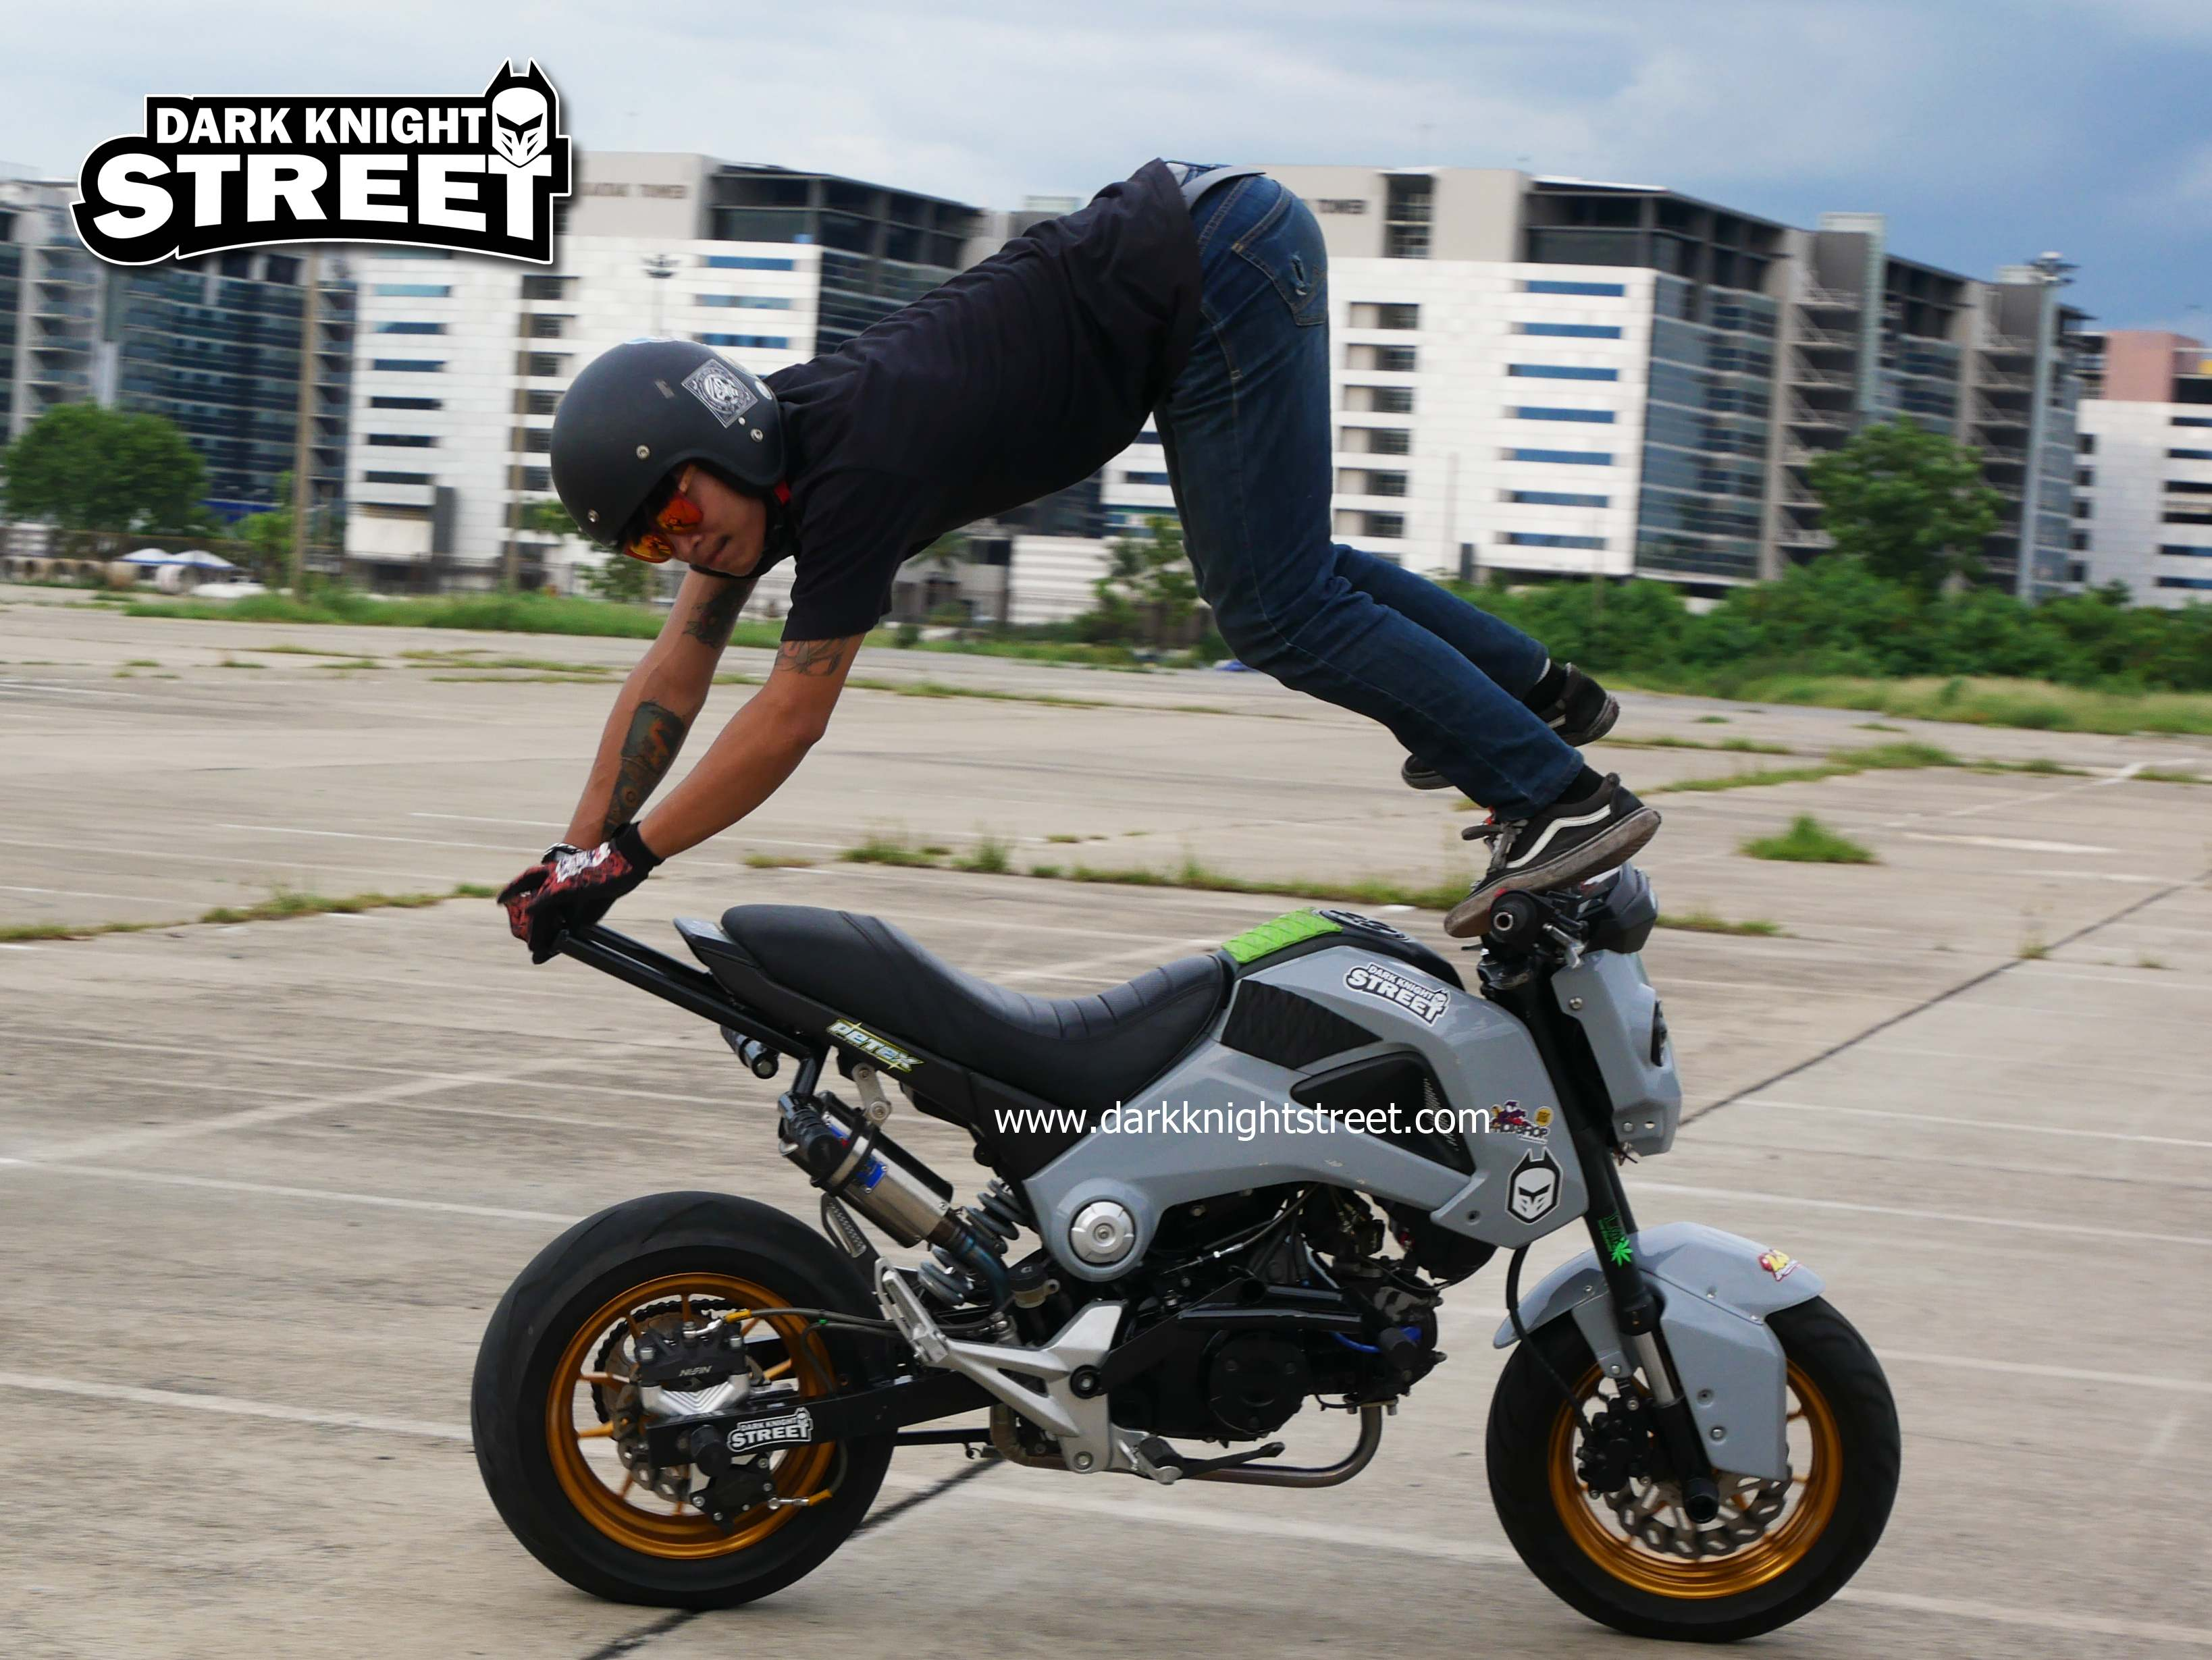 Honda Grom stunt parts - darkknightstreet : Inspired by LnwShop com